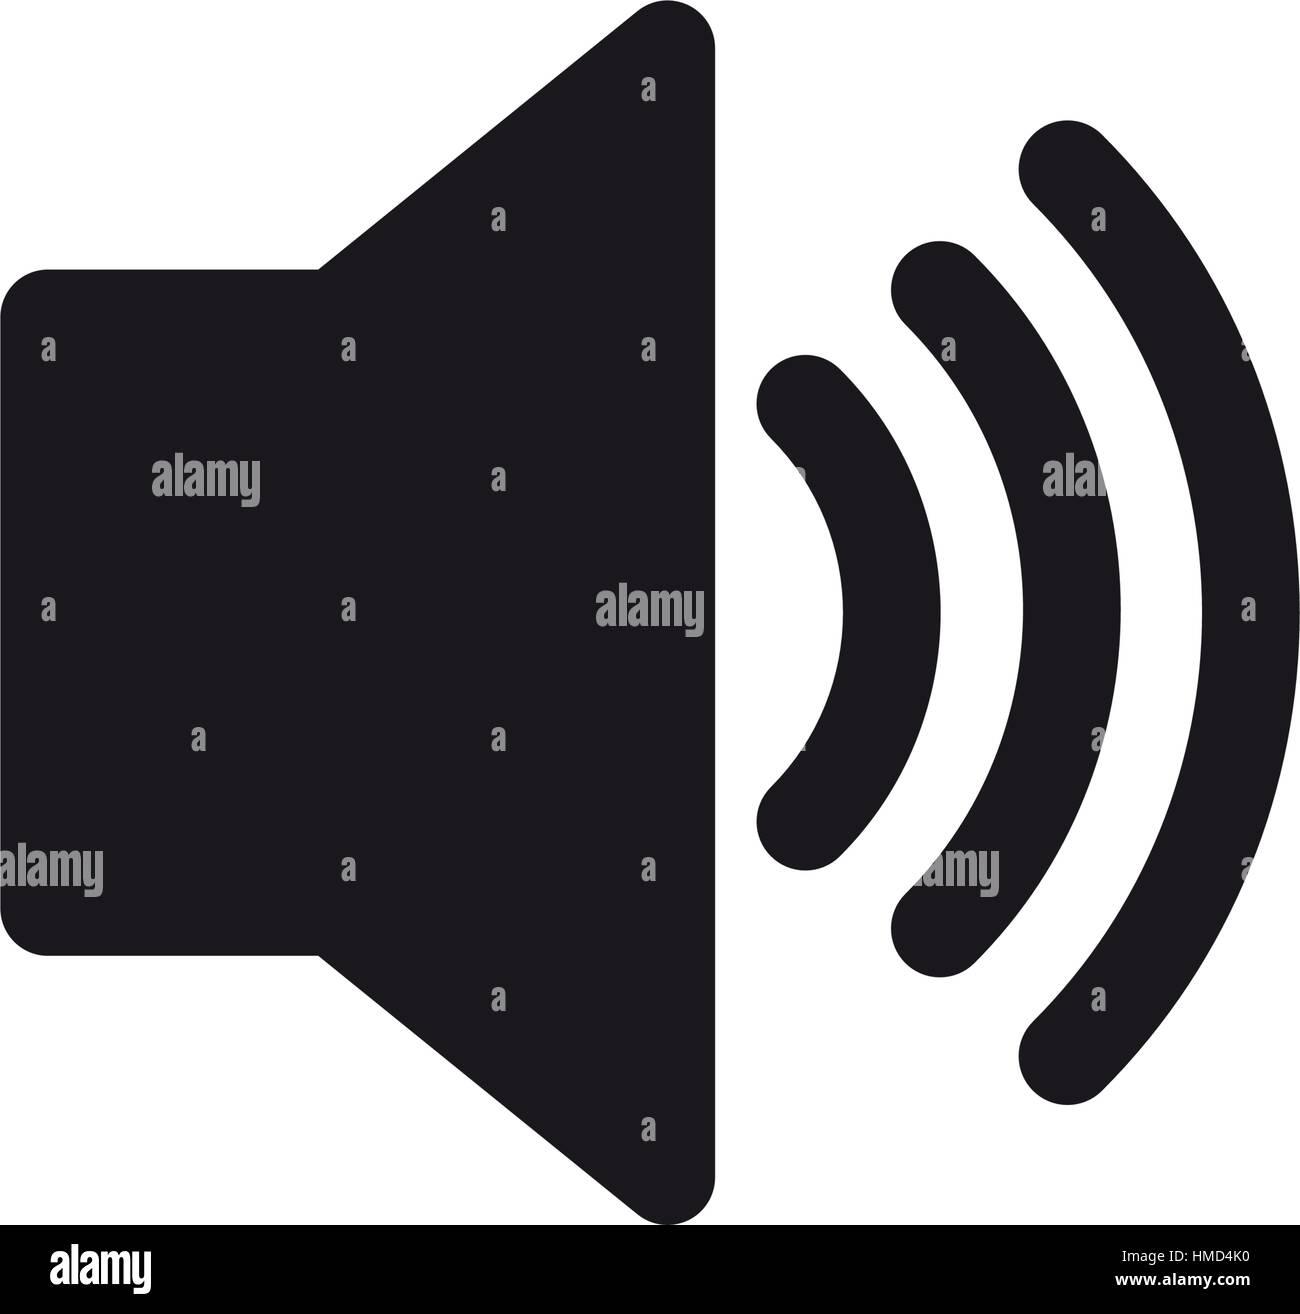 Lautsprecher-Lautstärke-Piktogramm Vektor Abbildung - Bild ...